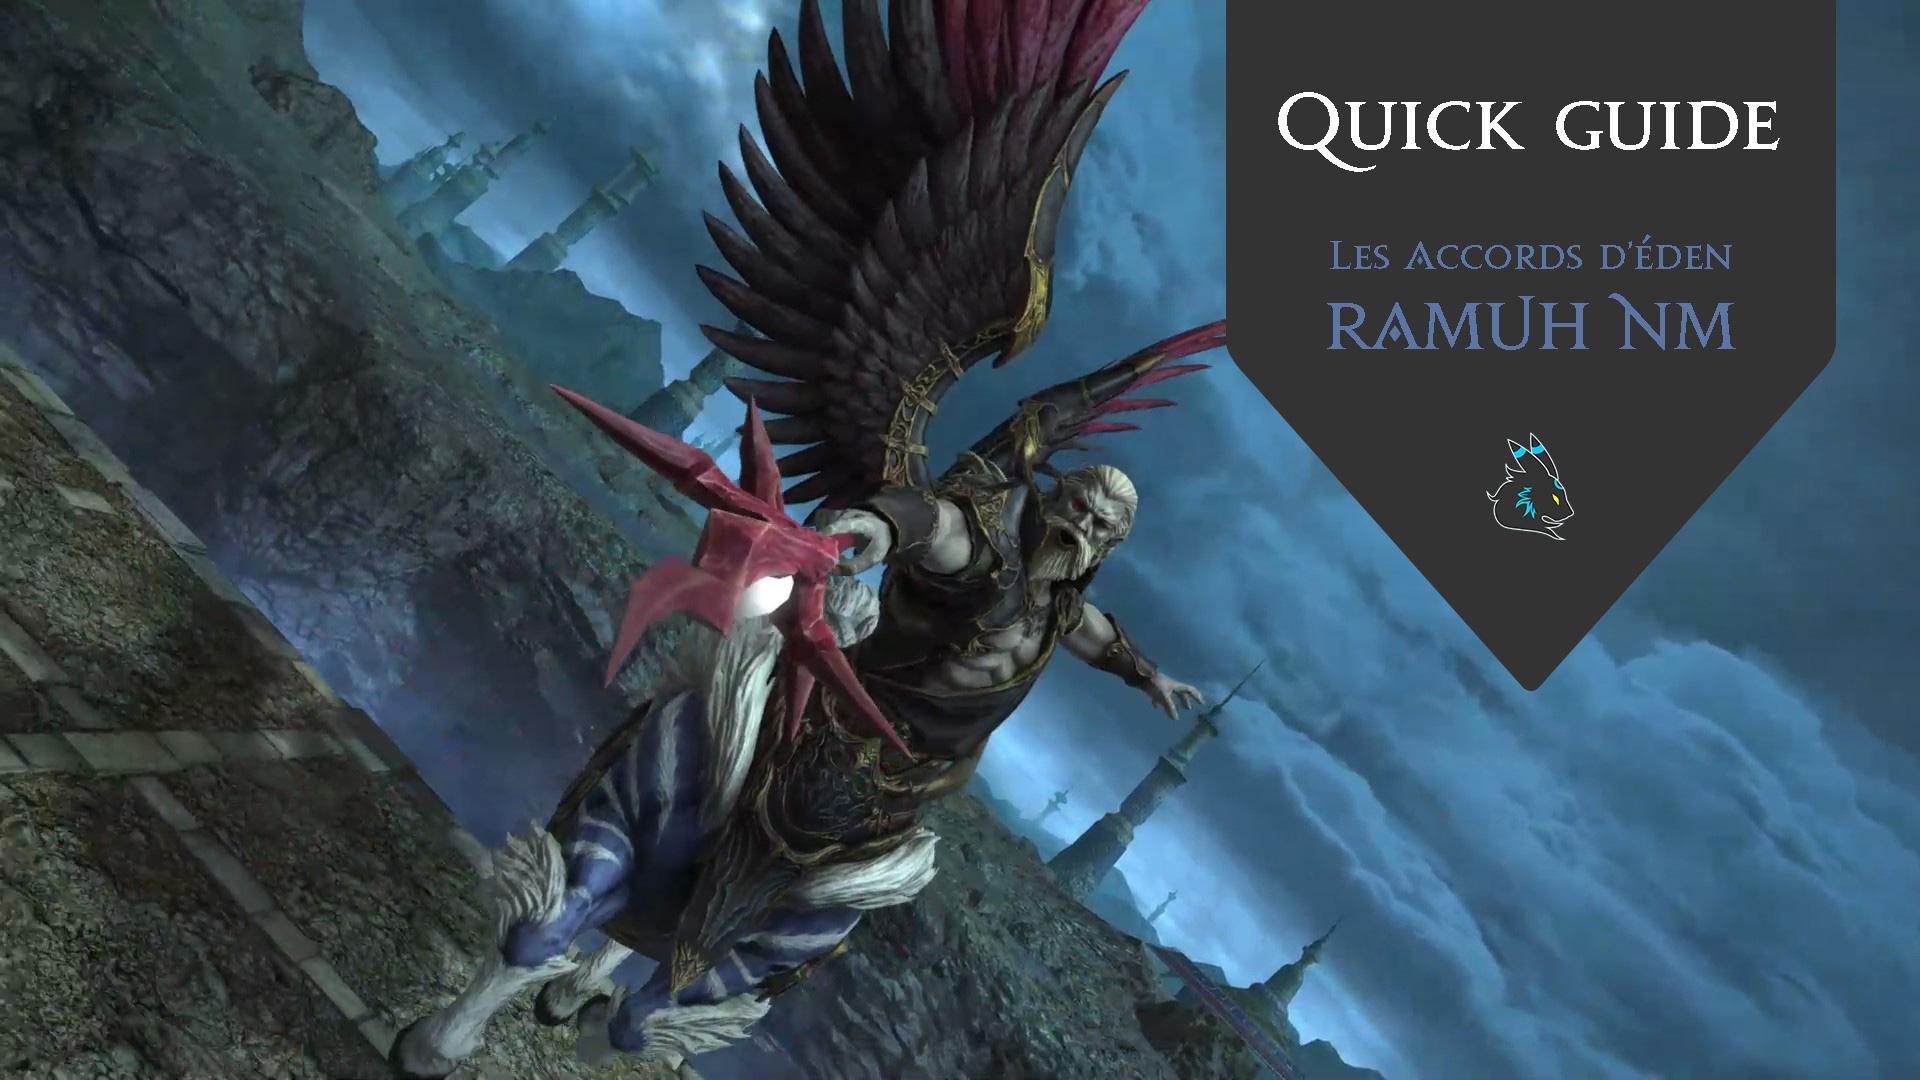 Les Accords d'Eden – Fulmination (Quick guide NM)